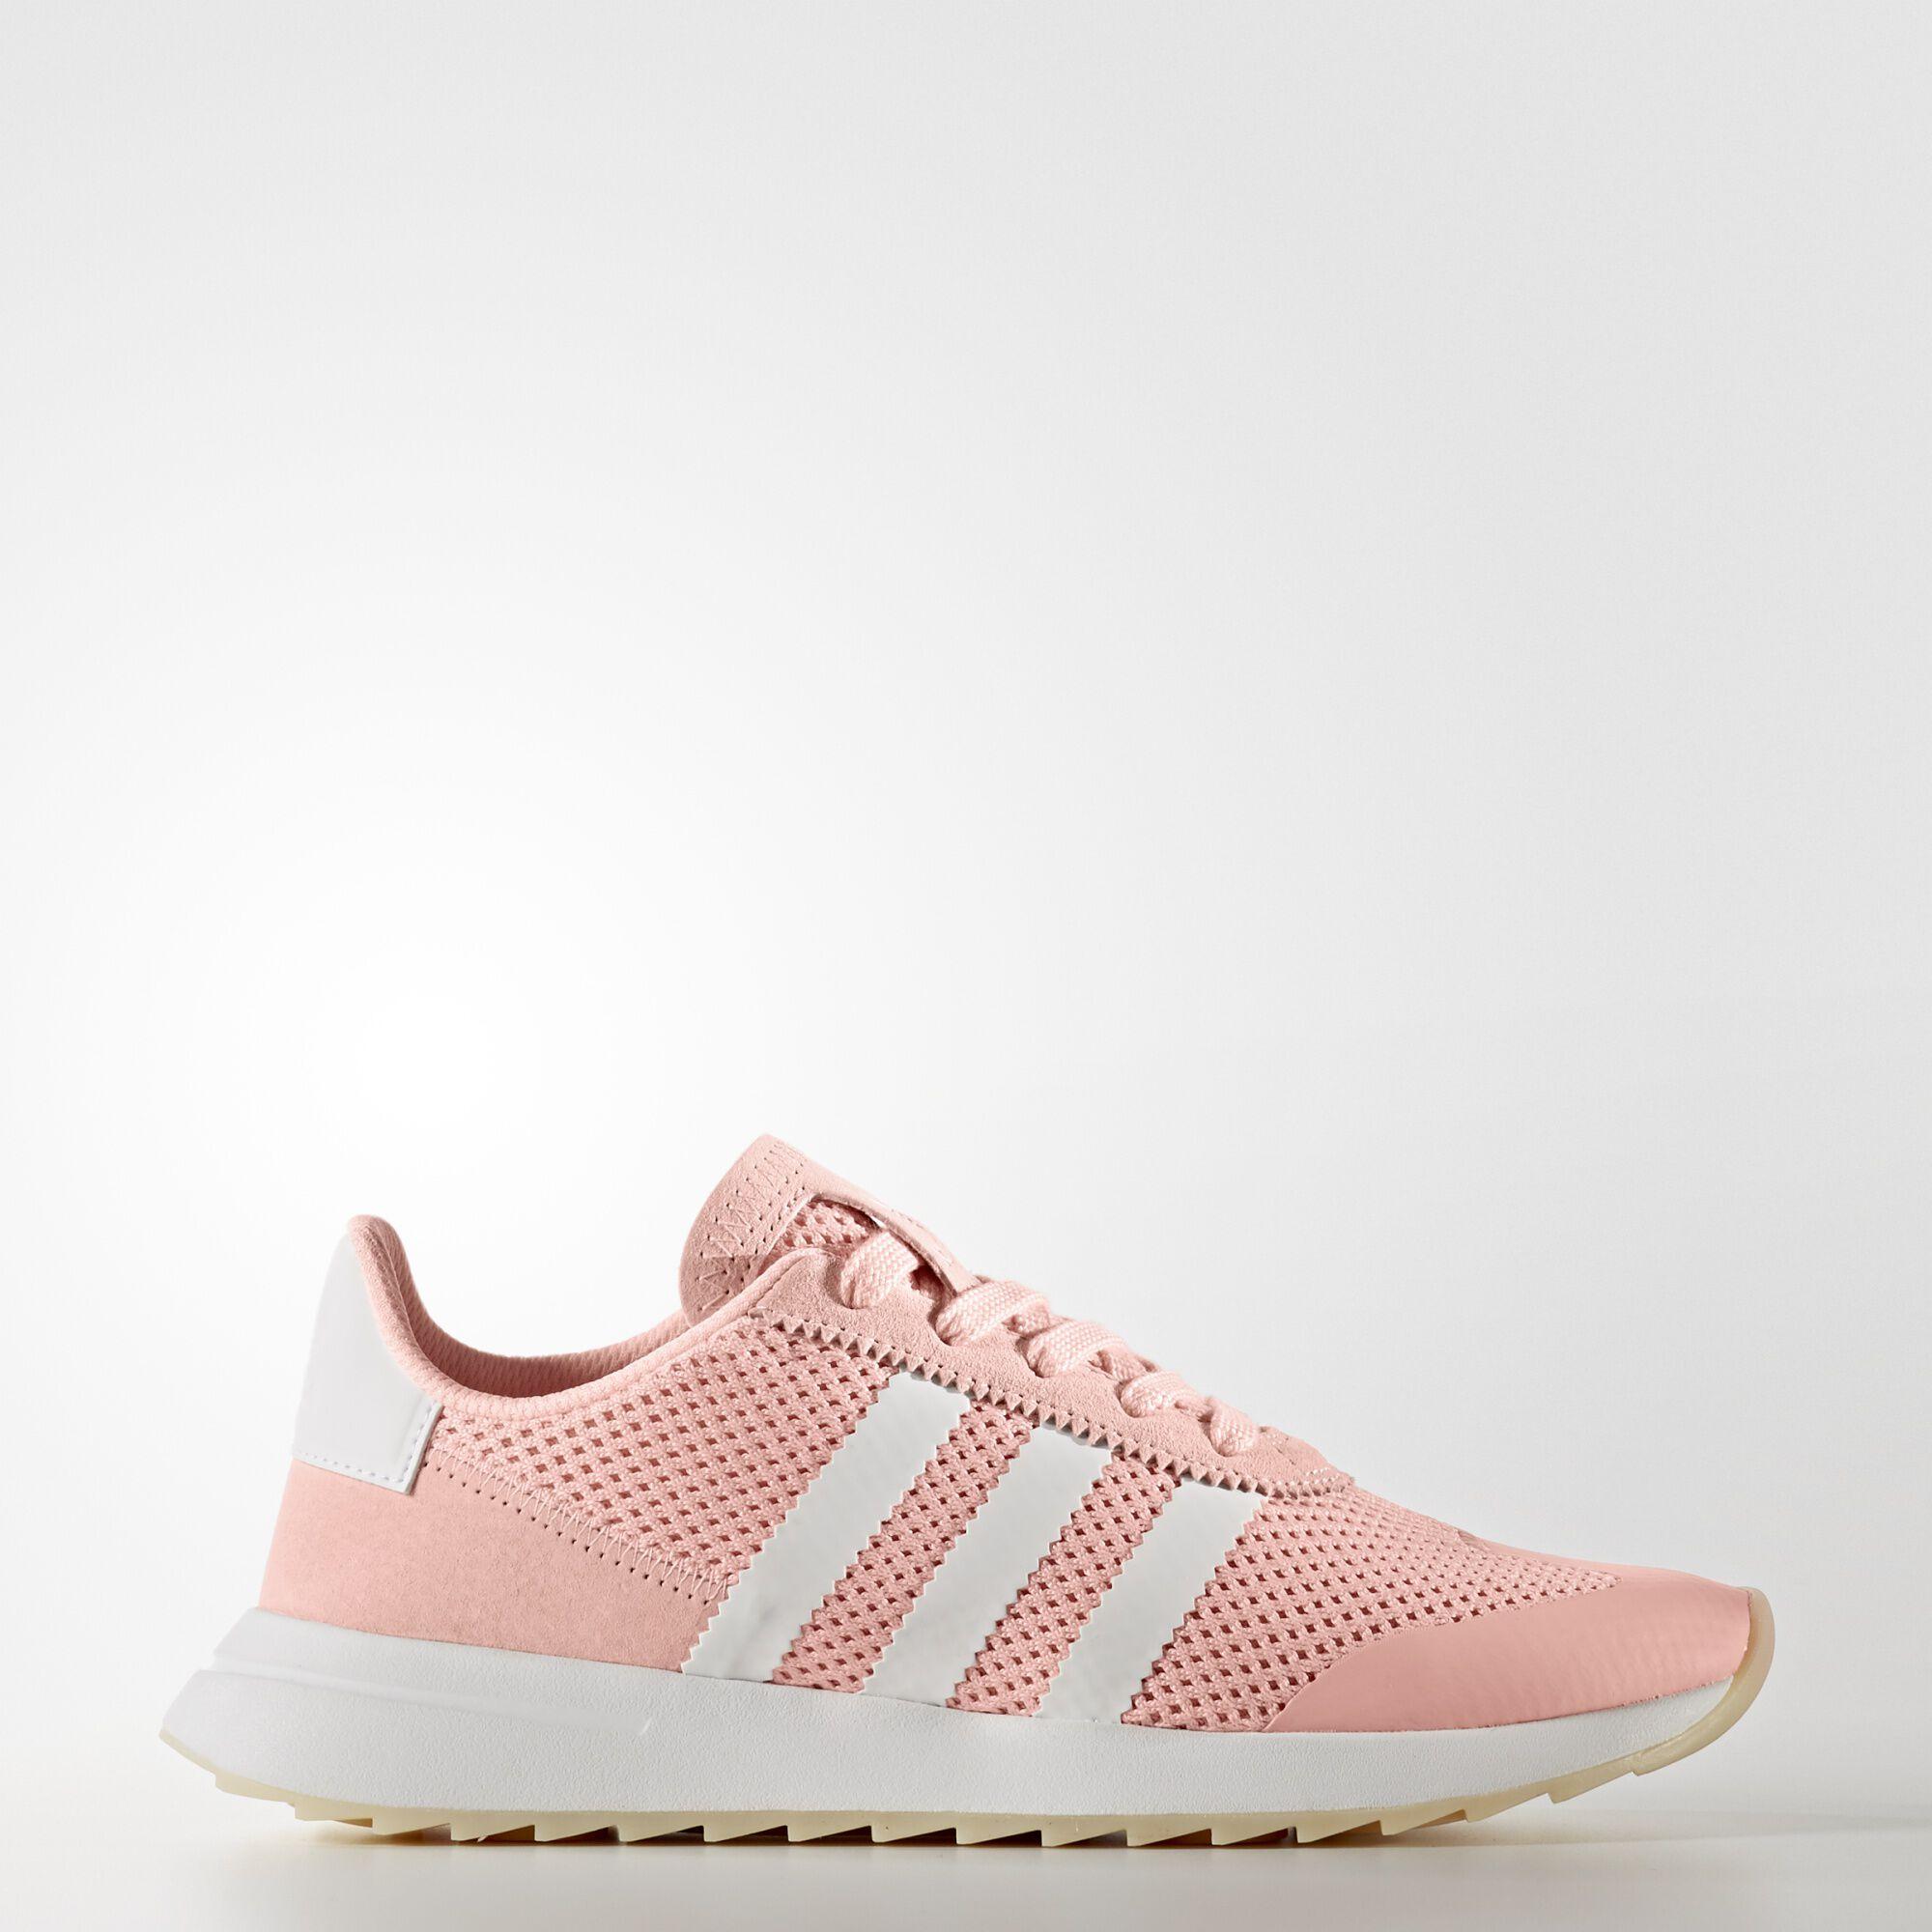 adidas flashback shoes pink adidas us. Black Bedroom Furniture Sets. Home Design Ideas